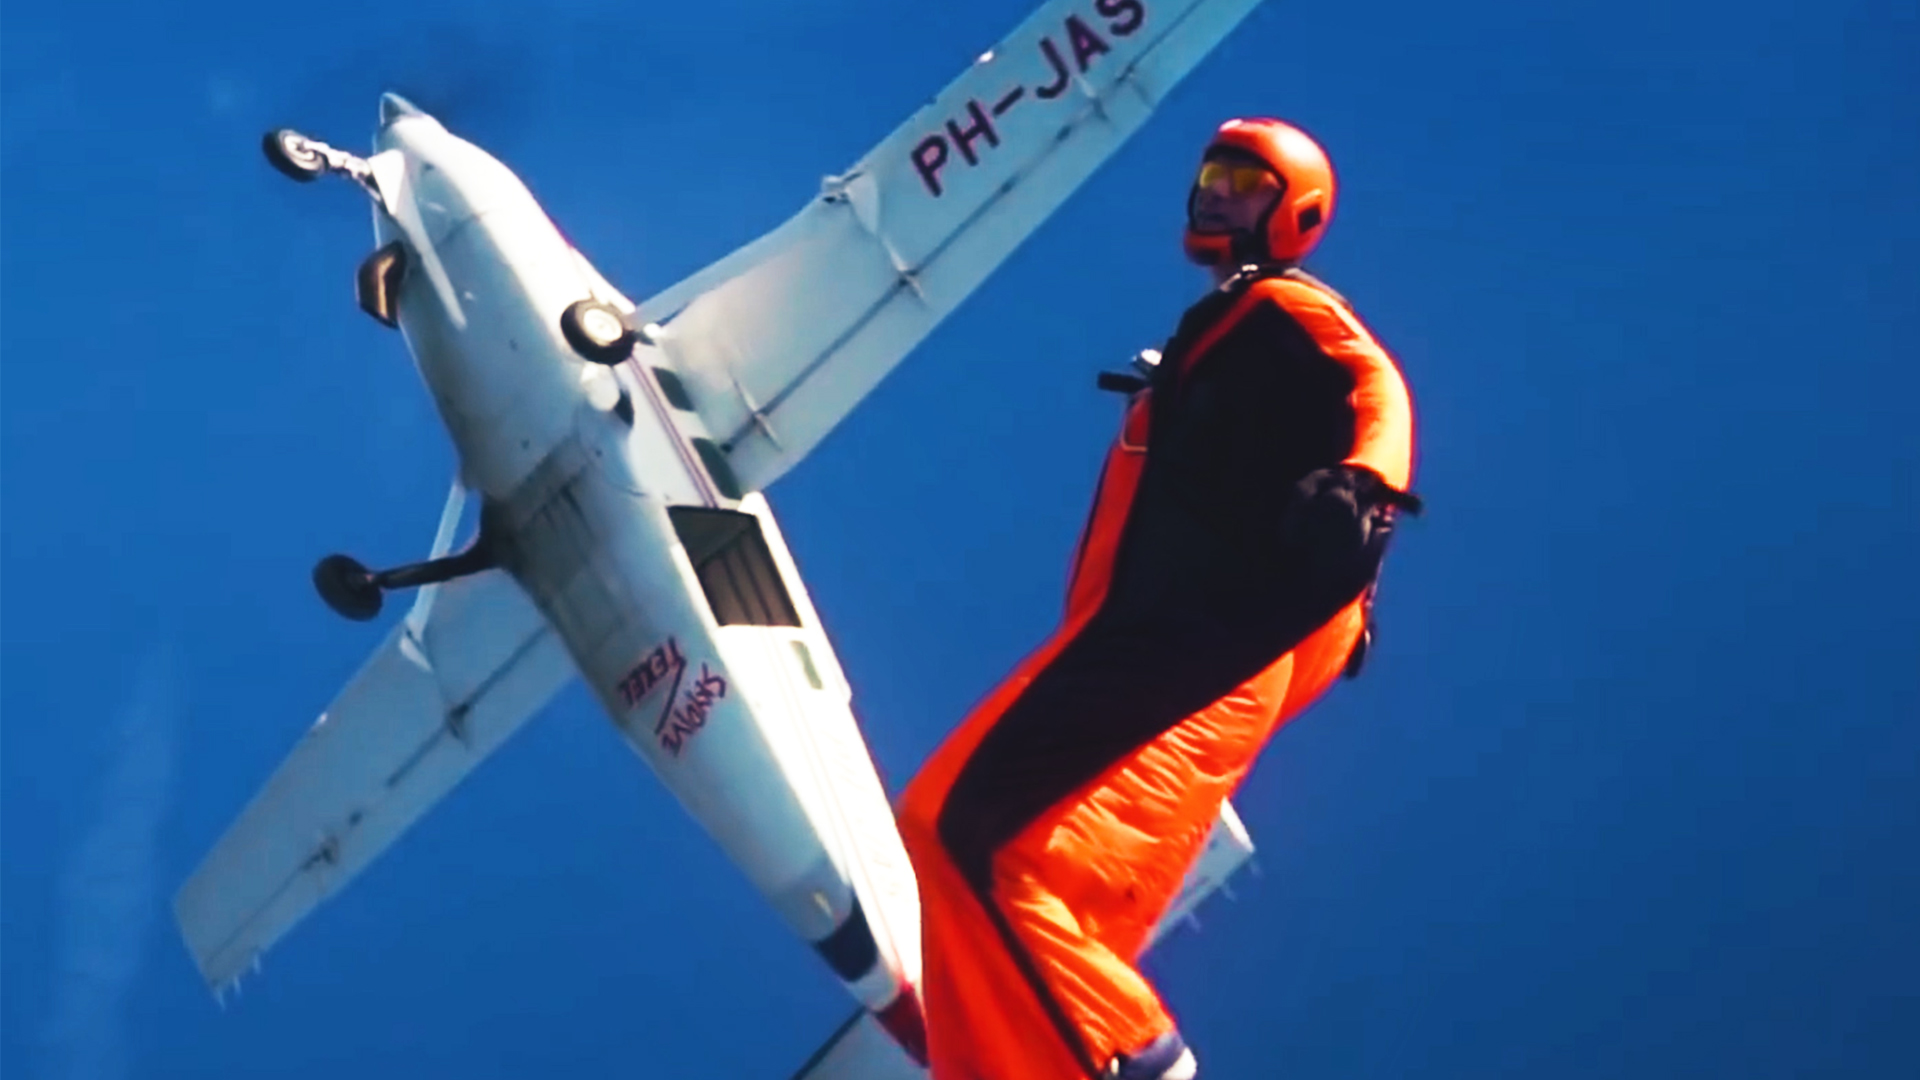 wingsuit act